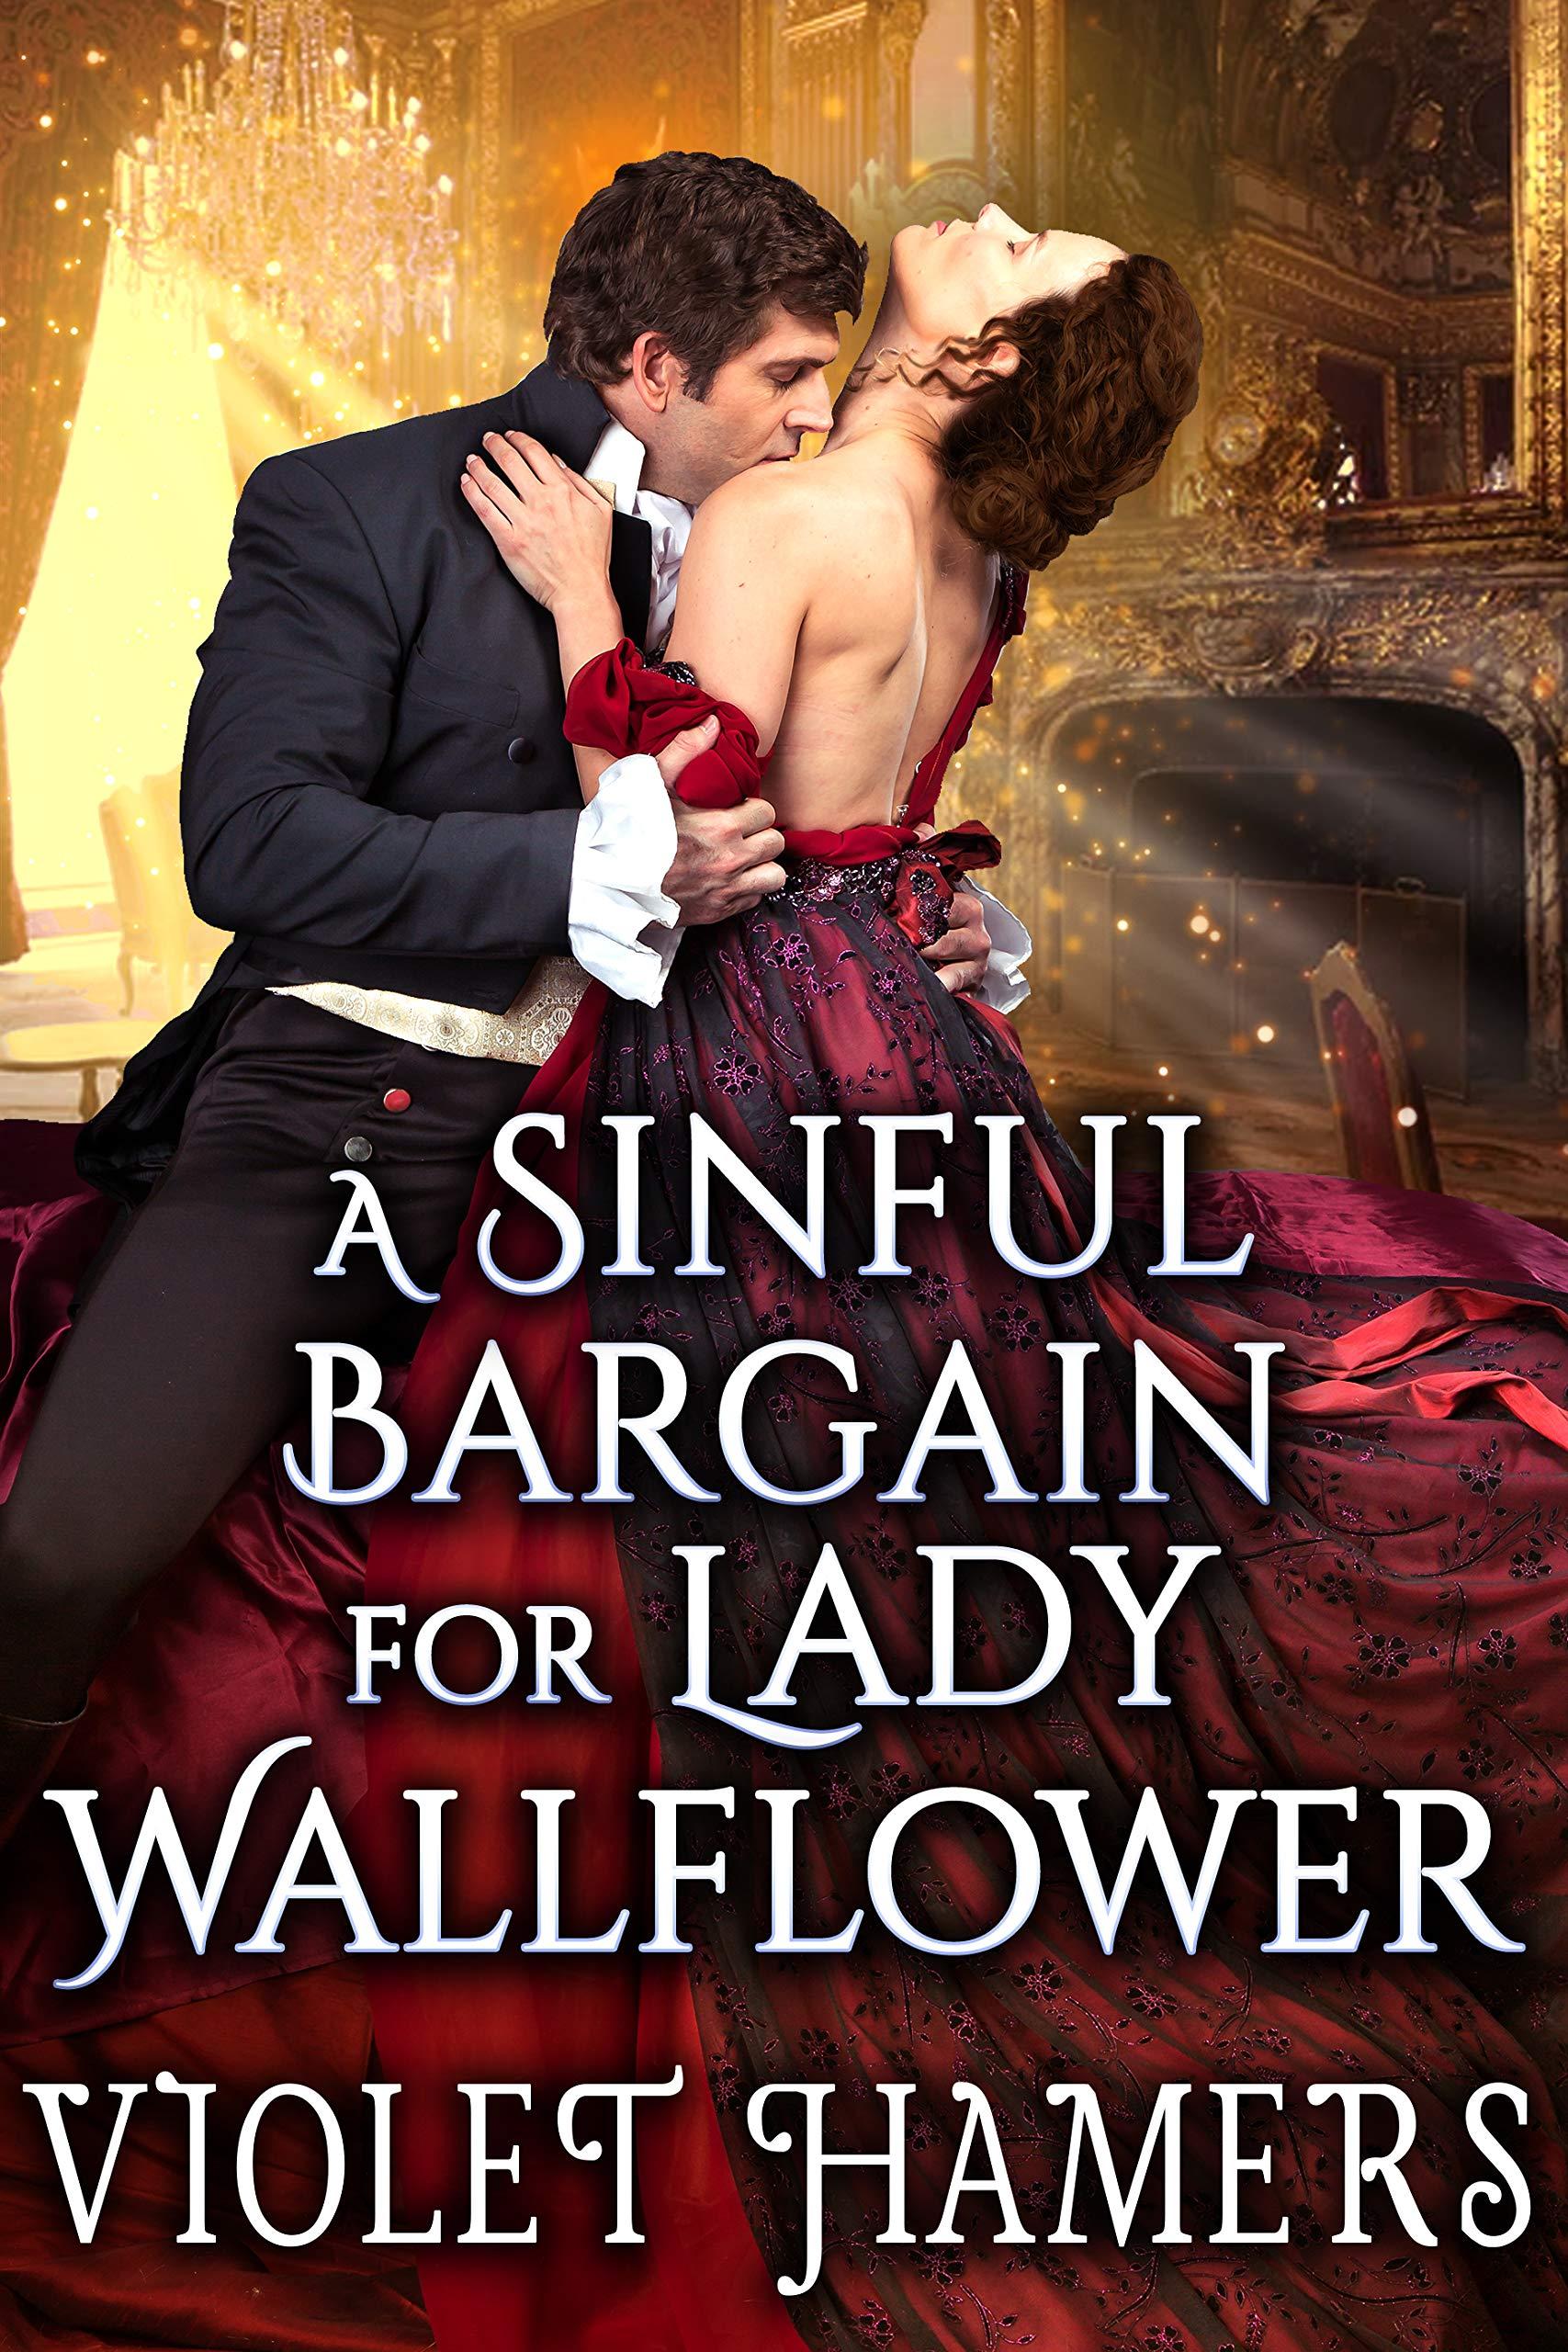 A Sinful Bargain for Lady Wallflower: A Steamy Historical Regency Romance Novel